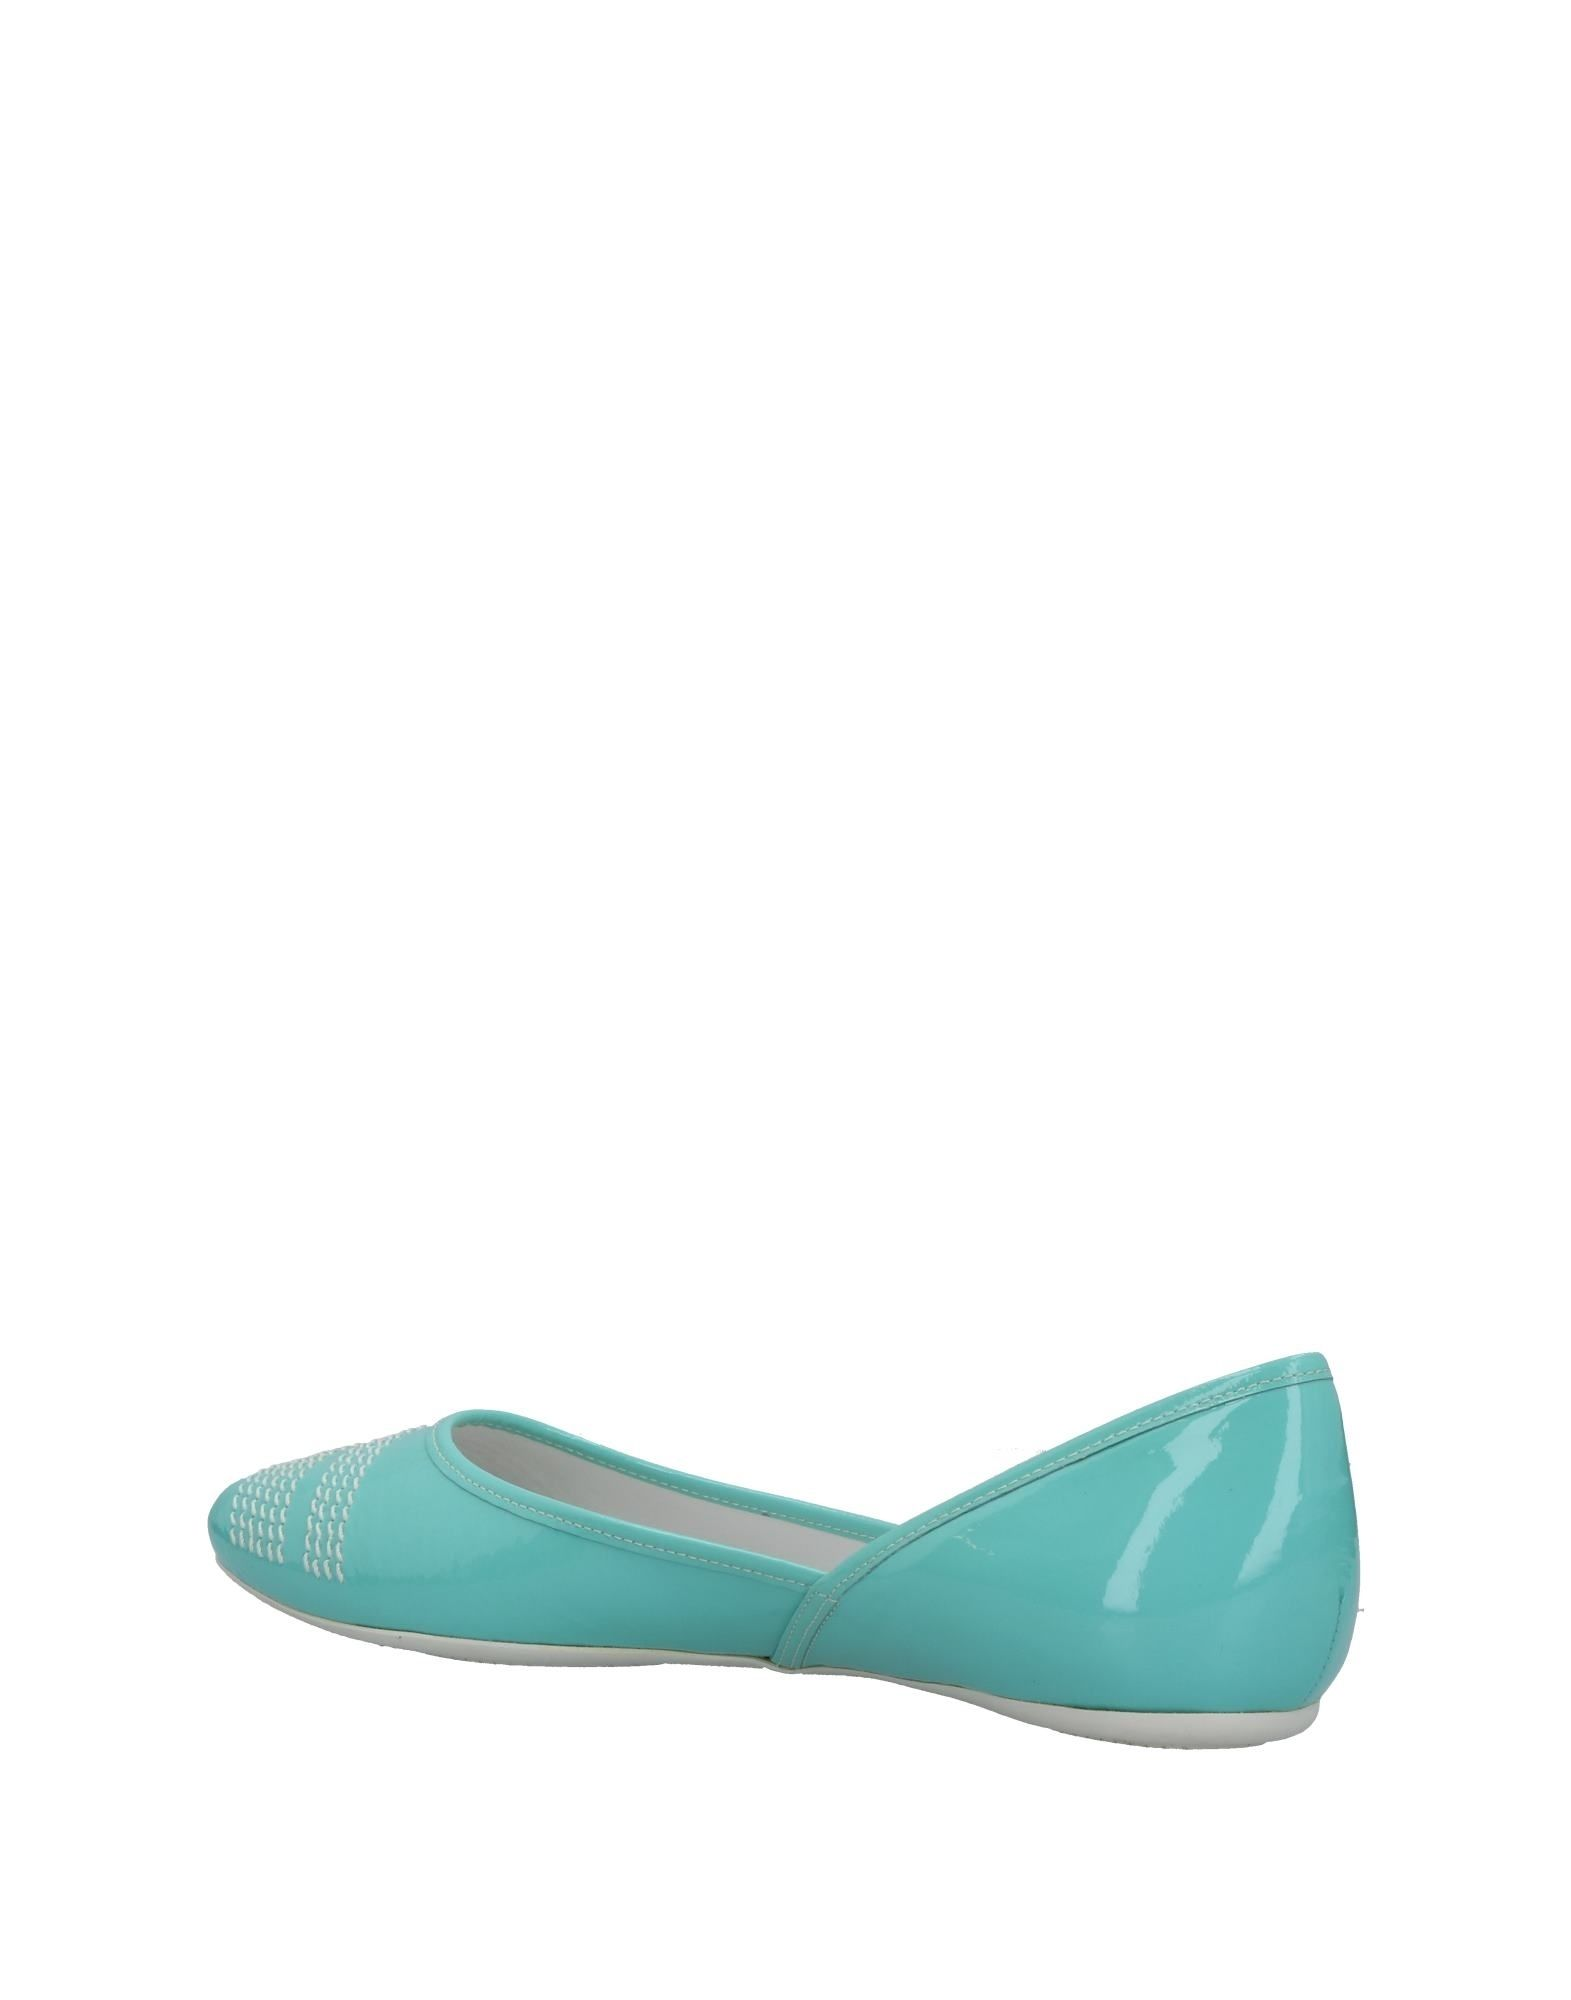 Hogan Ballerinas Damen  11396983DU Gute Qualität beliebte Schuhe